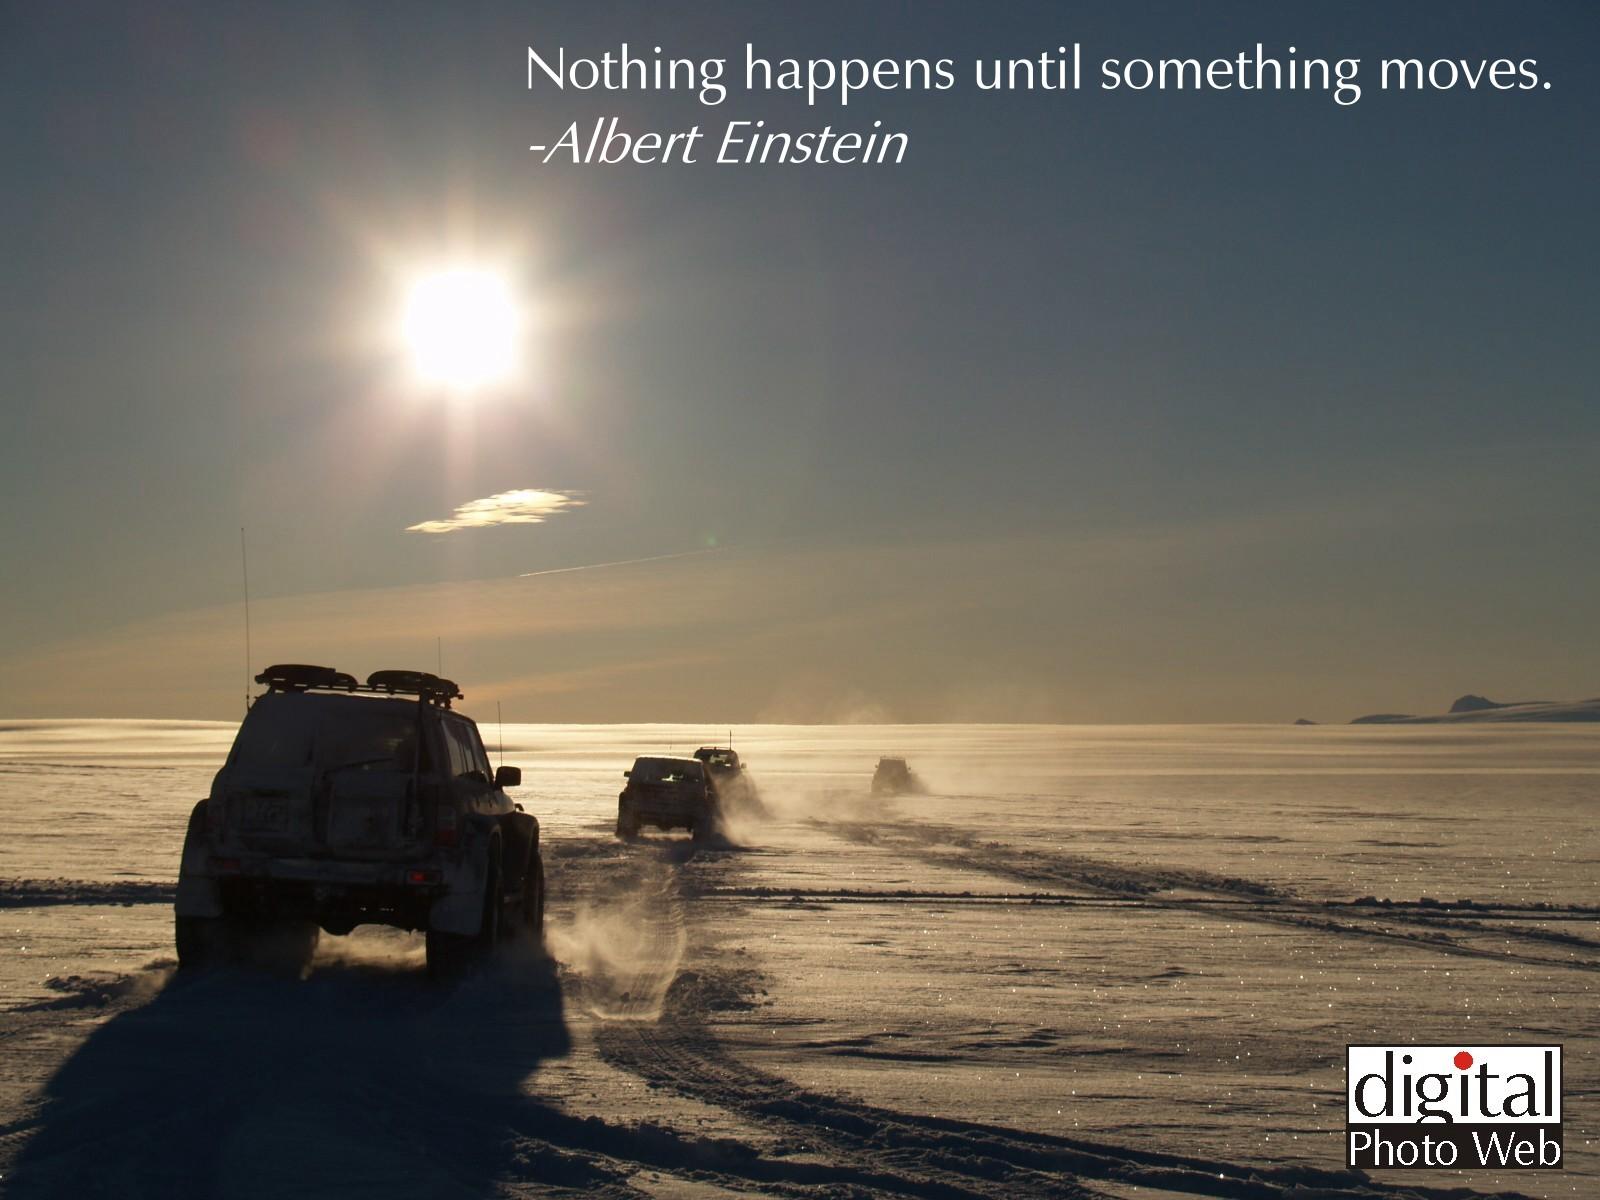 Inspirational Quotes Screensaver 1600x1200